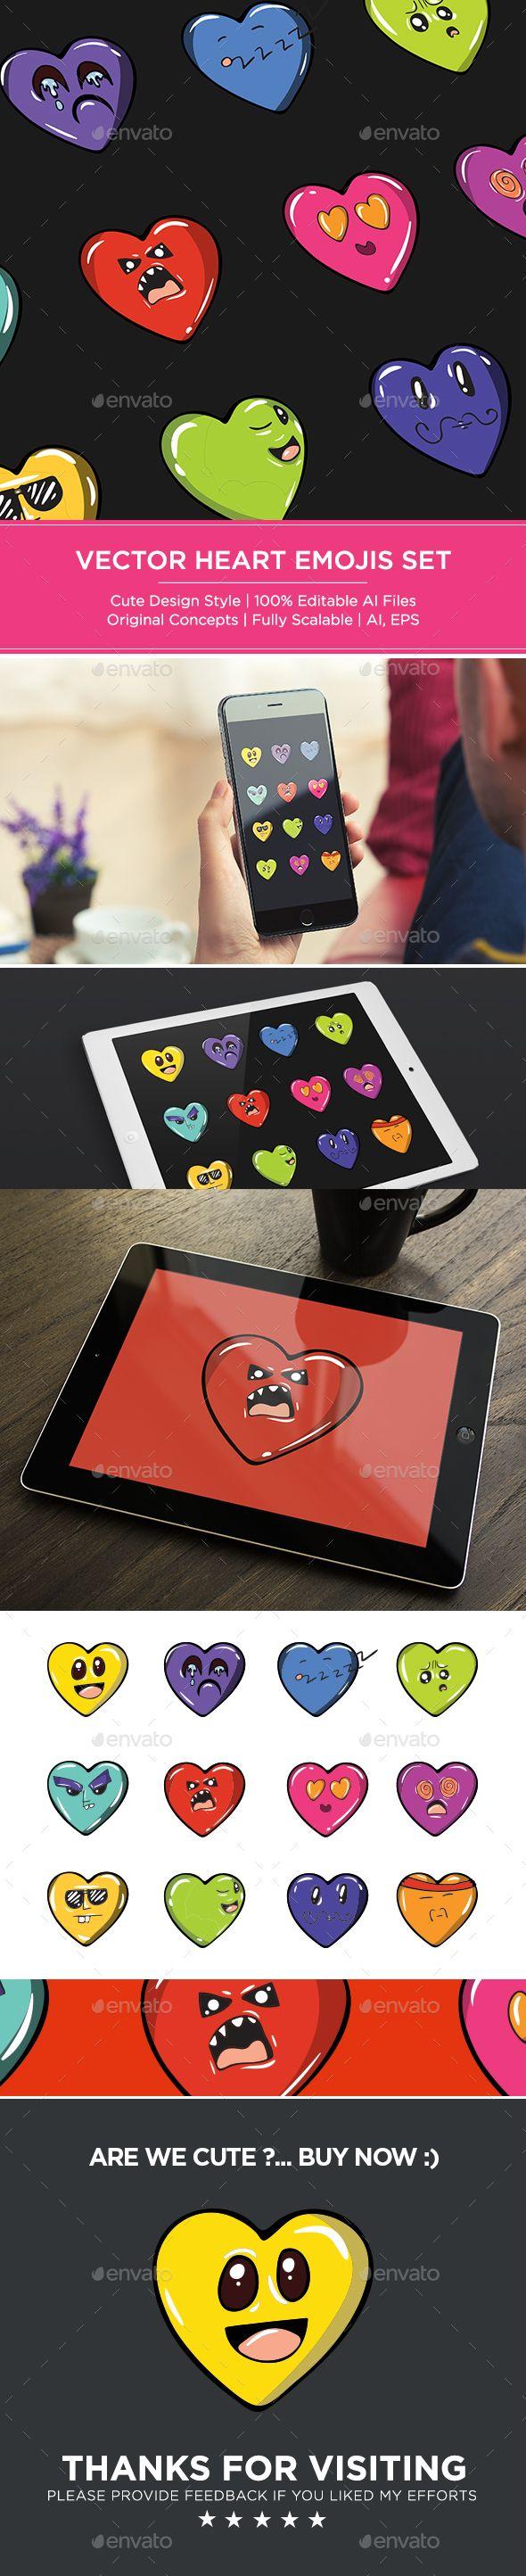 Heart Emoji Set